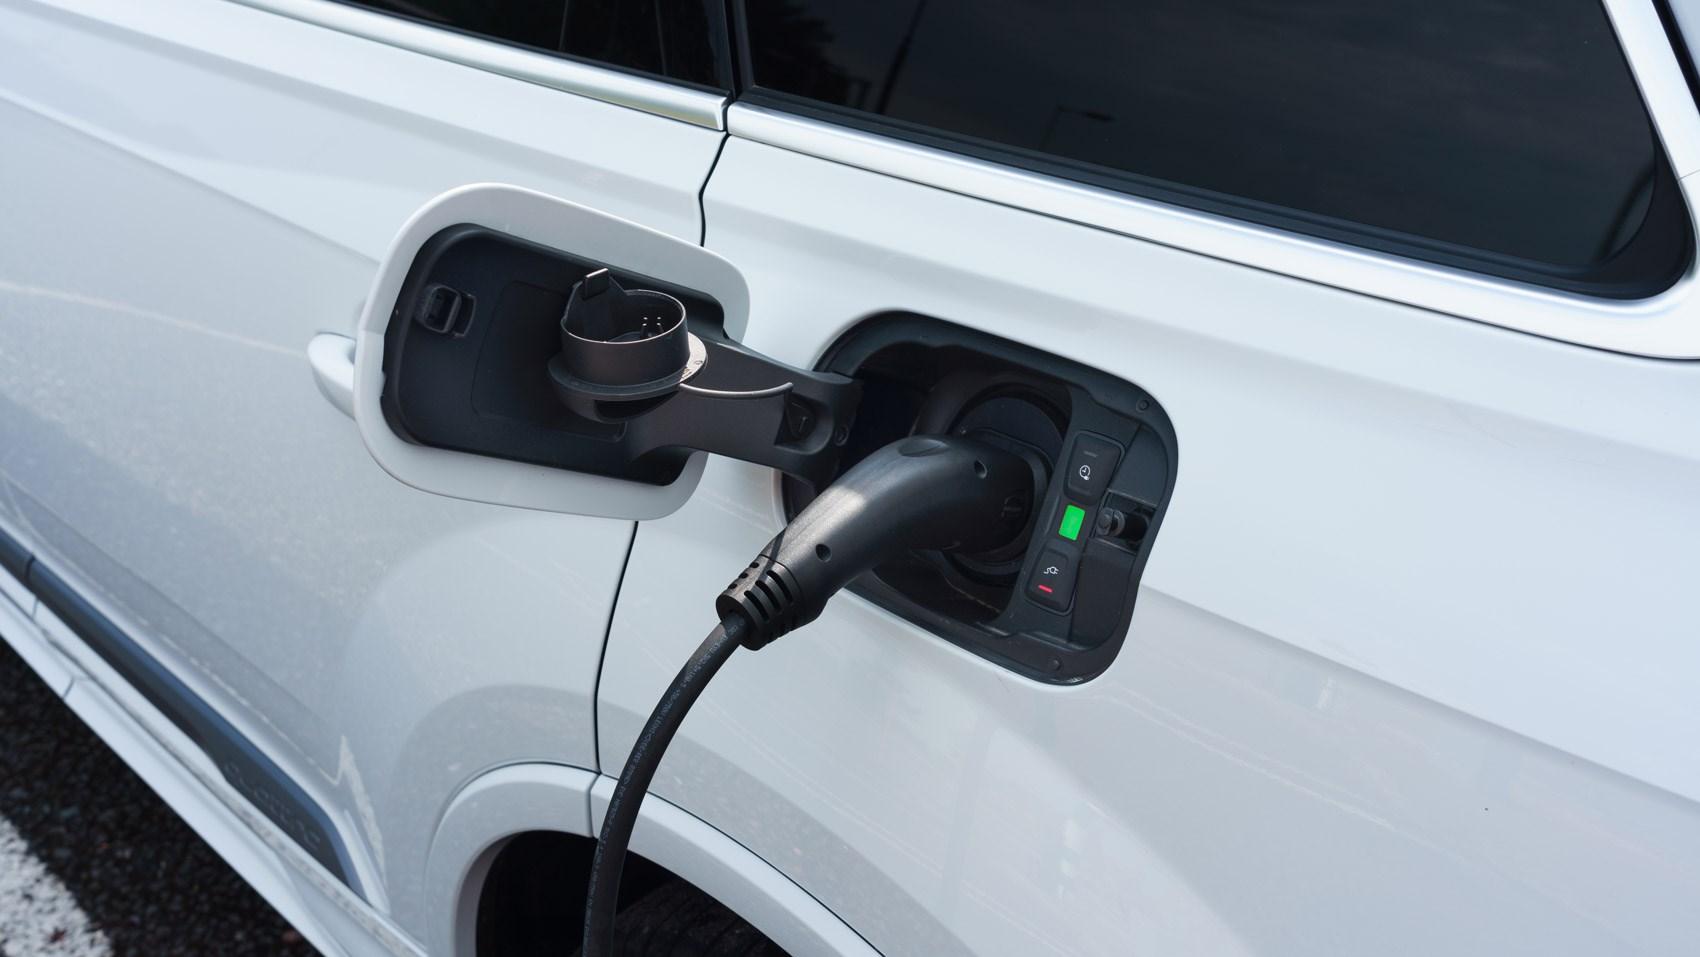 q7 hybrid plug